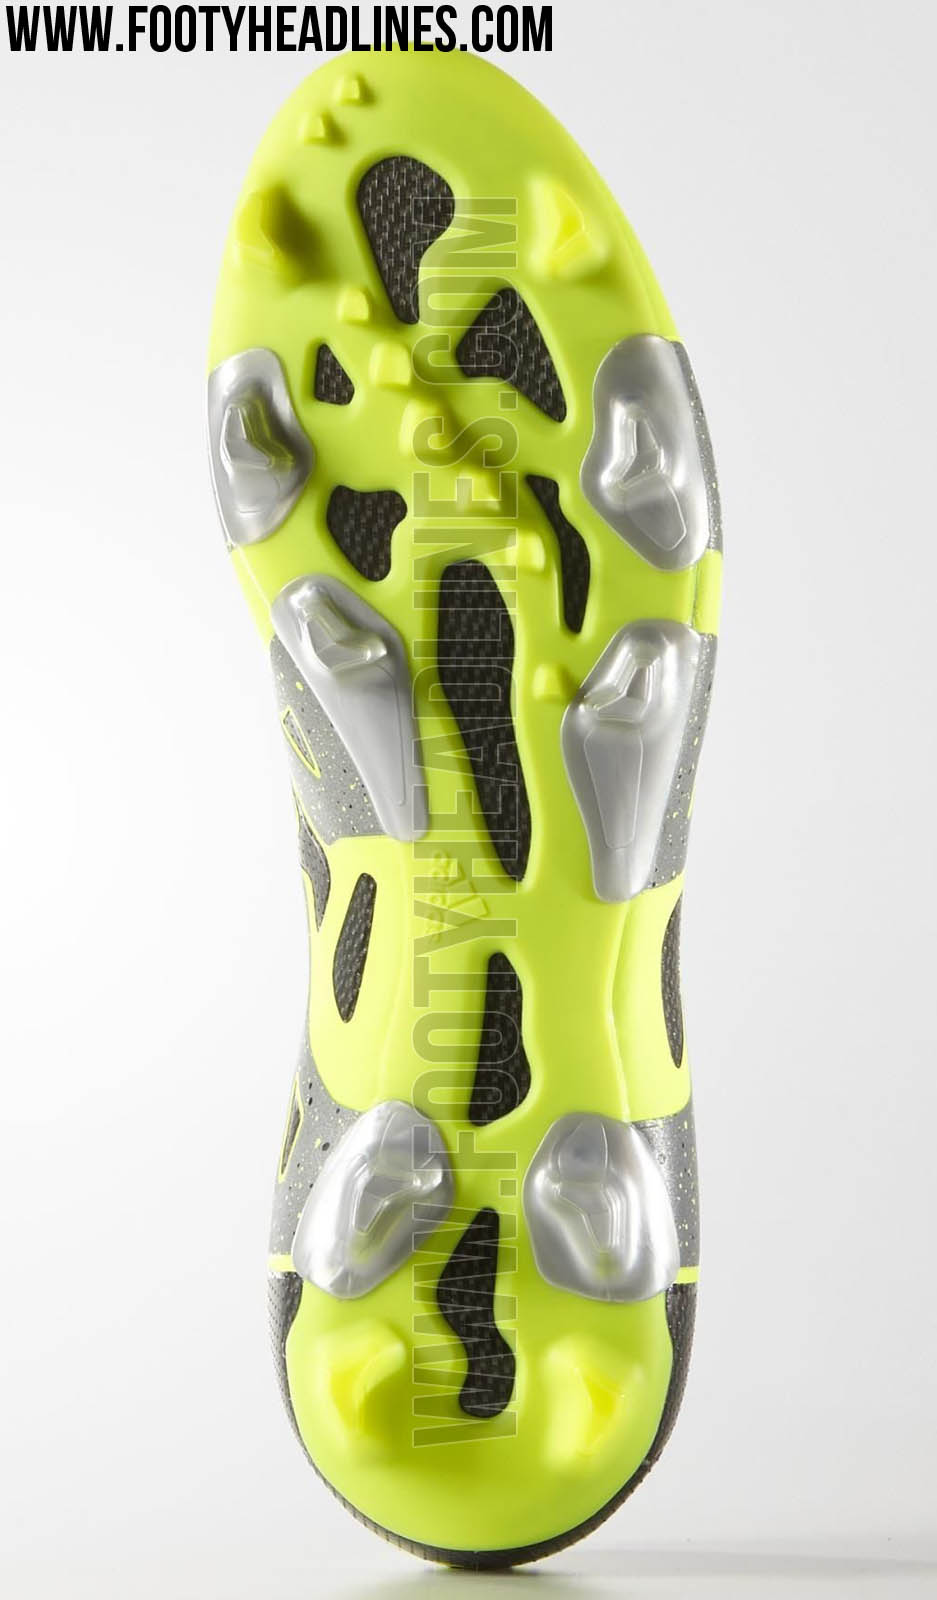 Discount Grey   Yellow Adidas X 2015-2016 Reflective Boots Released 9e0e689c4ed4e